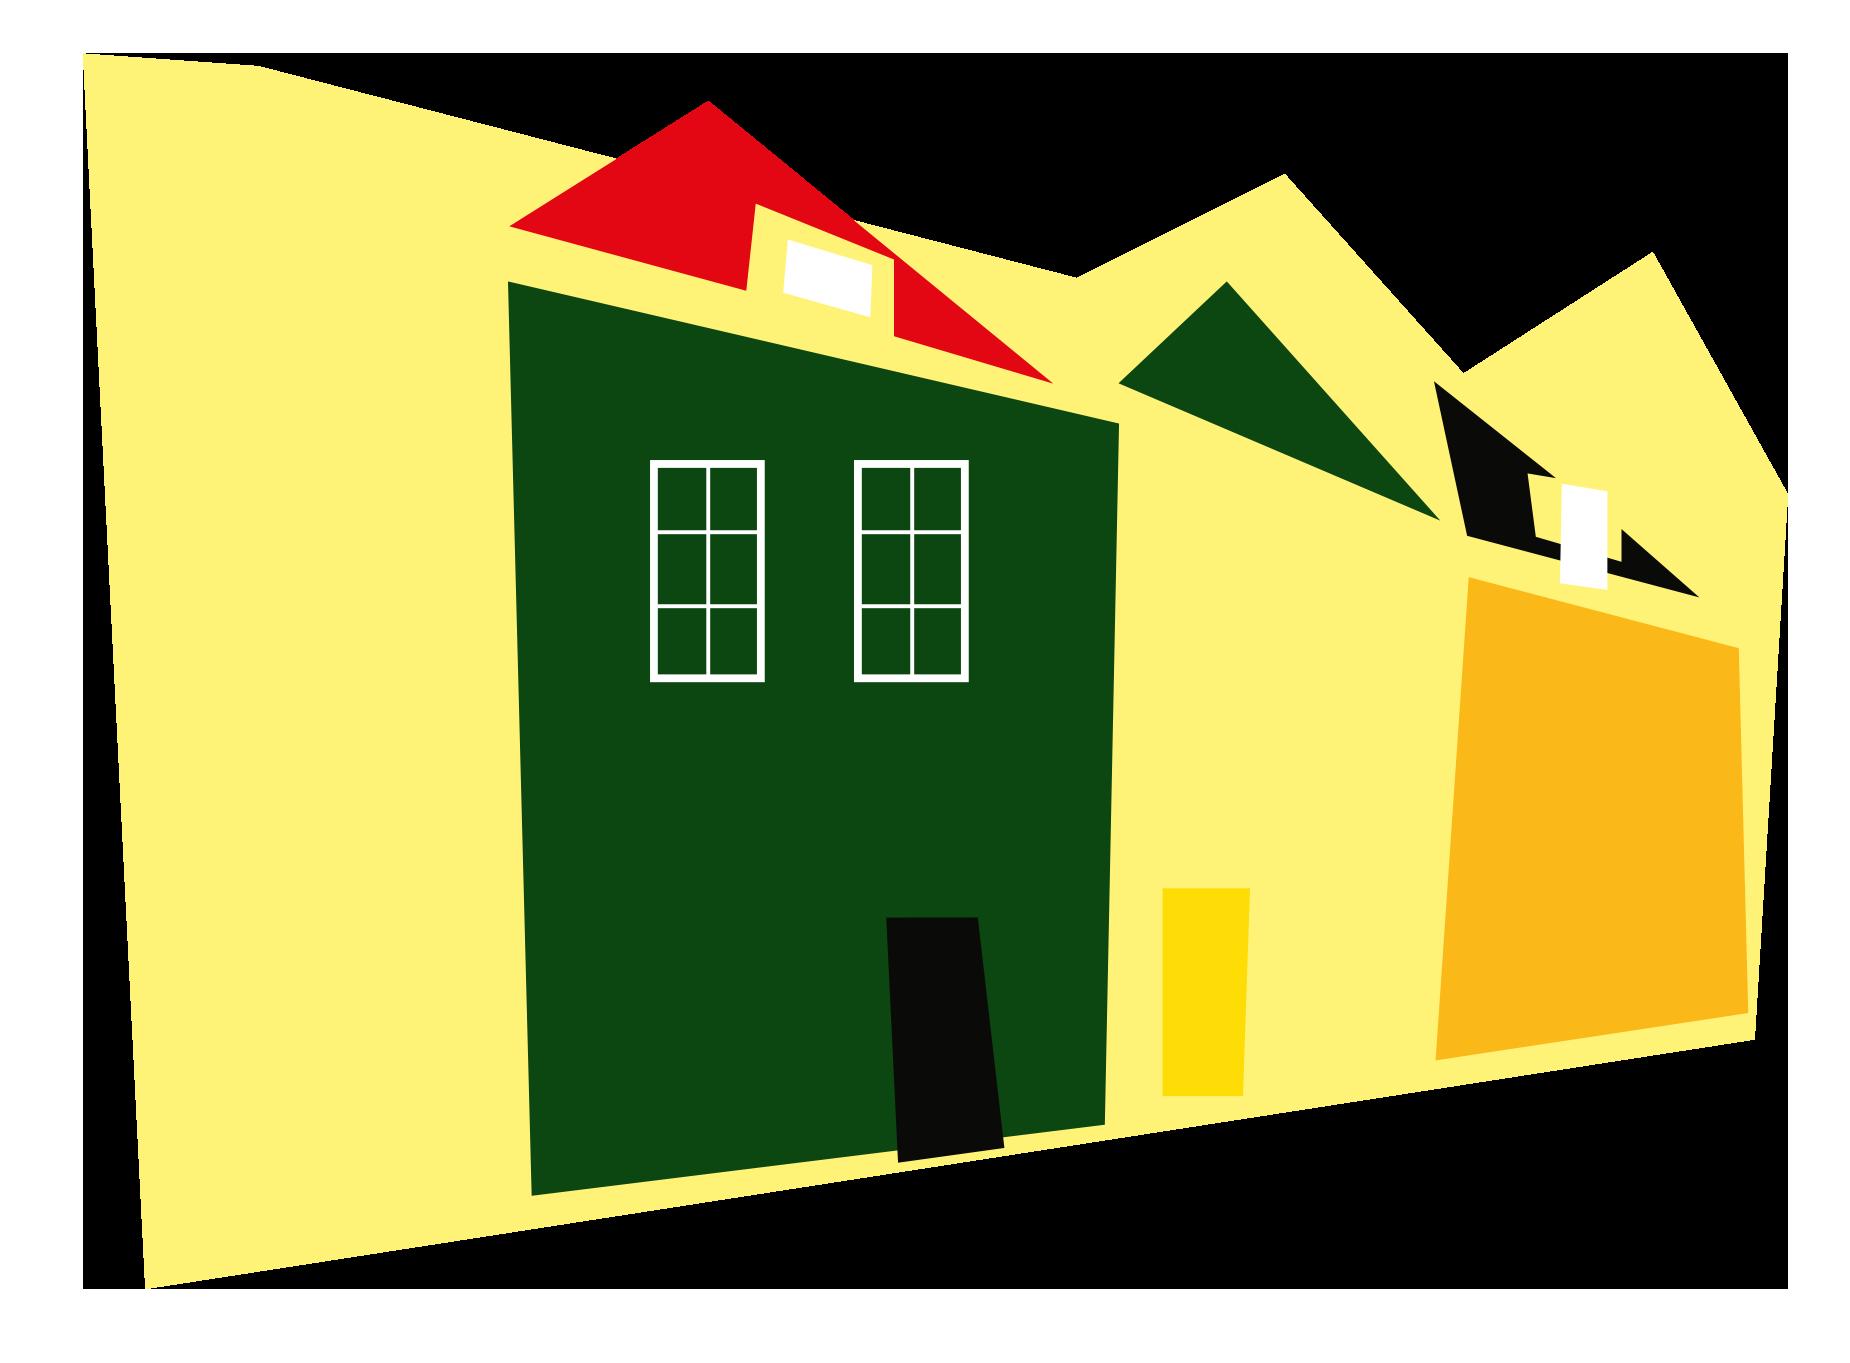 Stadsfestival-huis-2